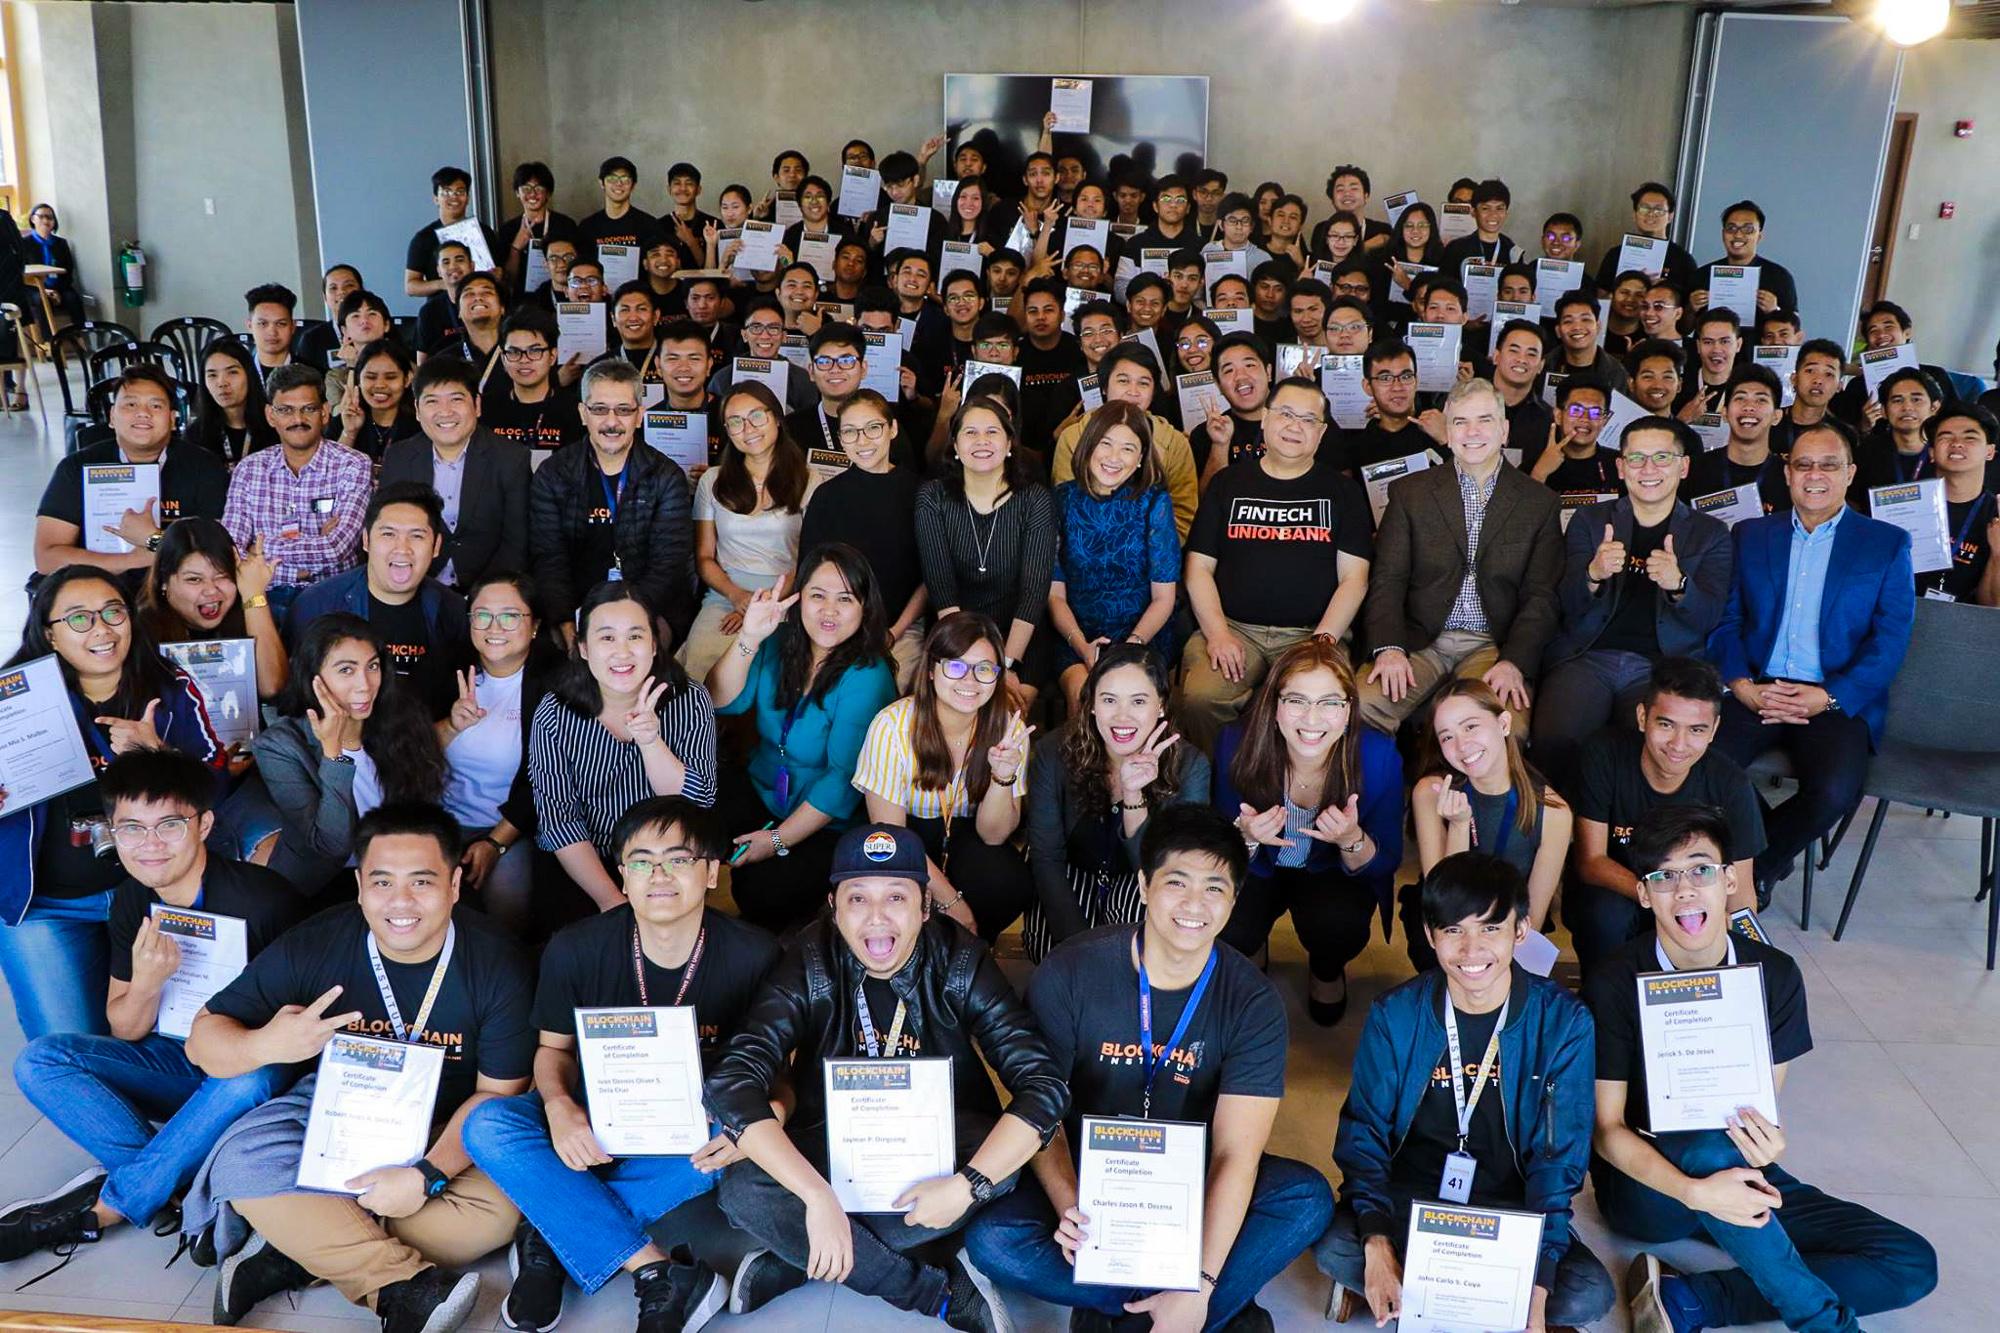 THE FIRST 100. Blockchain Institute's Batch 1 graduates with UnionBank President & CEO Edwin Bautista and UnionBank HR Director Michelle Rubio